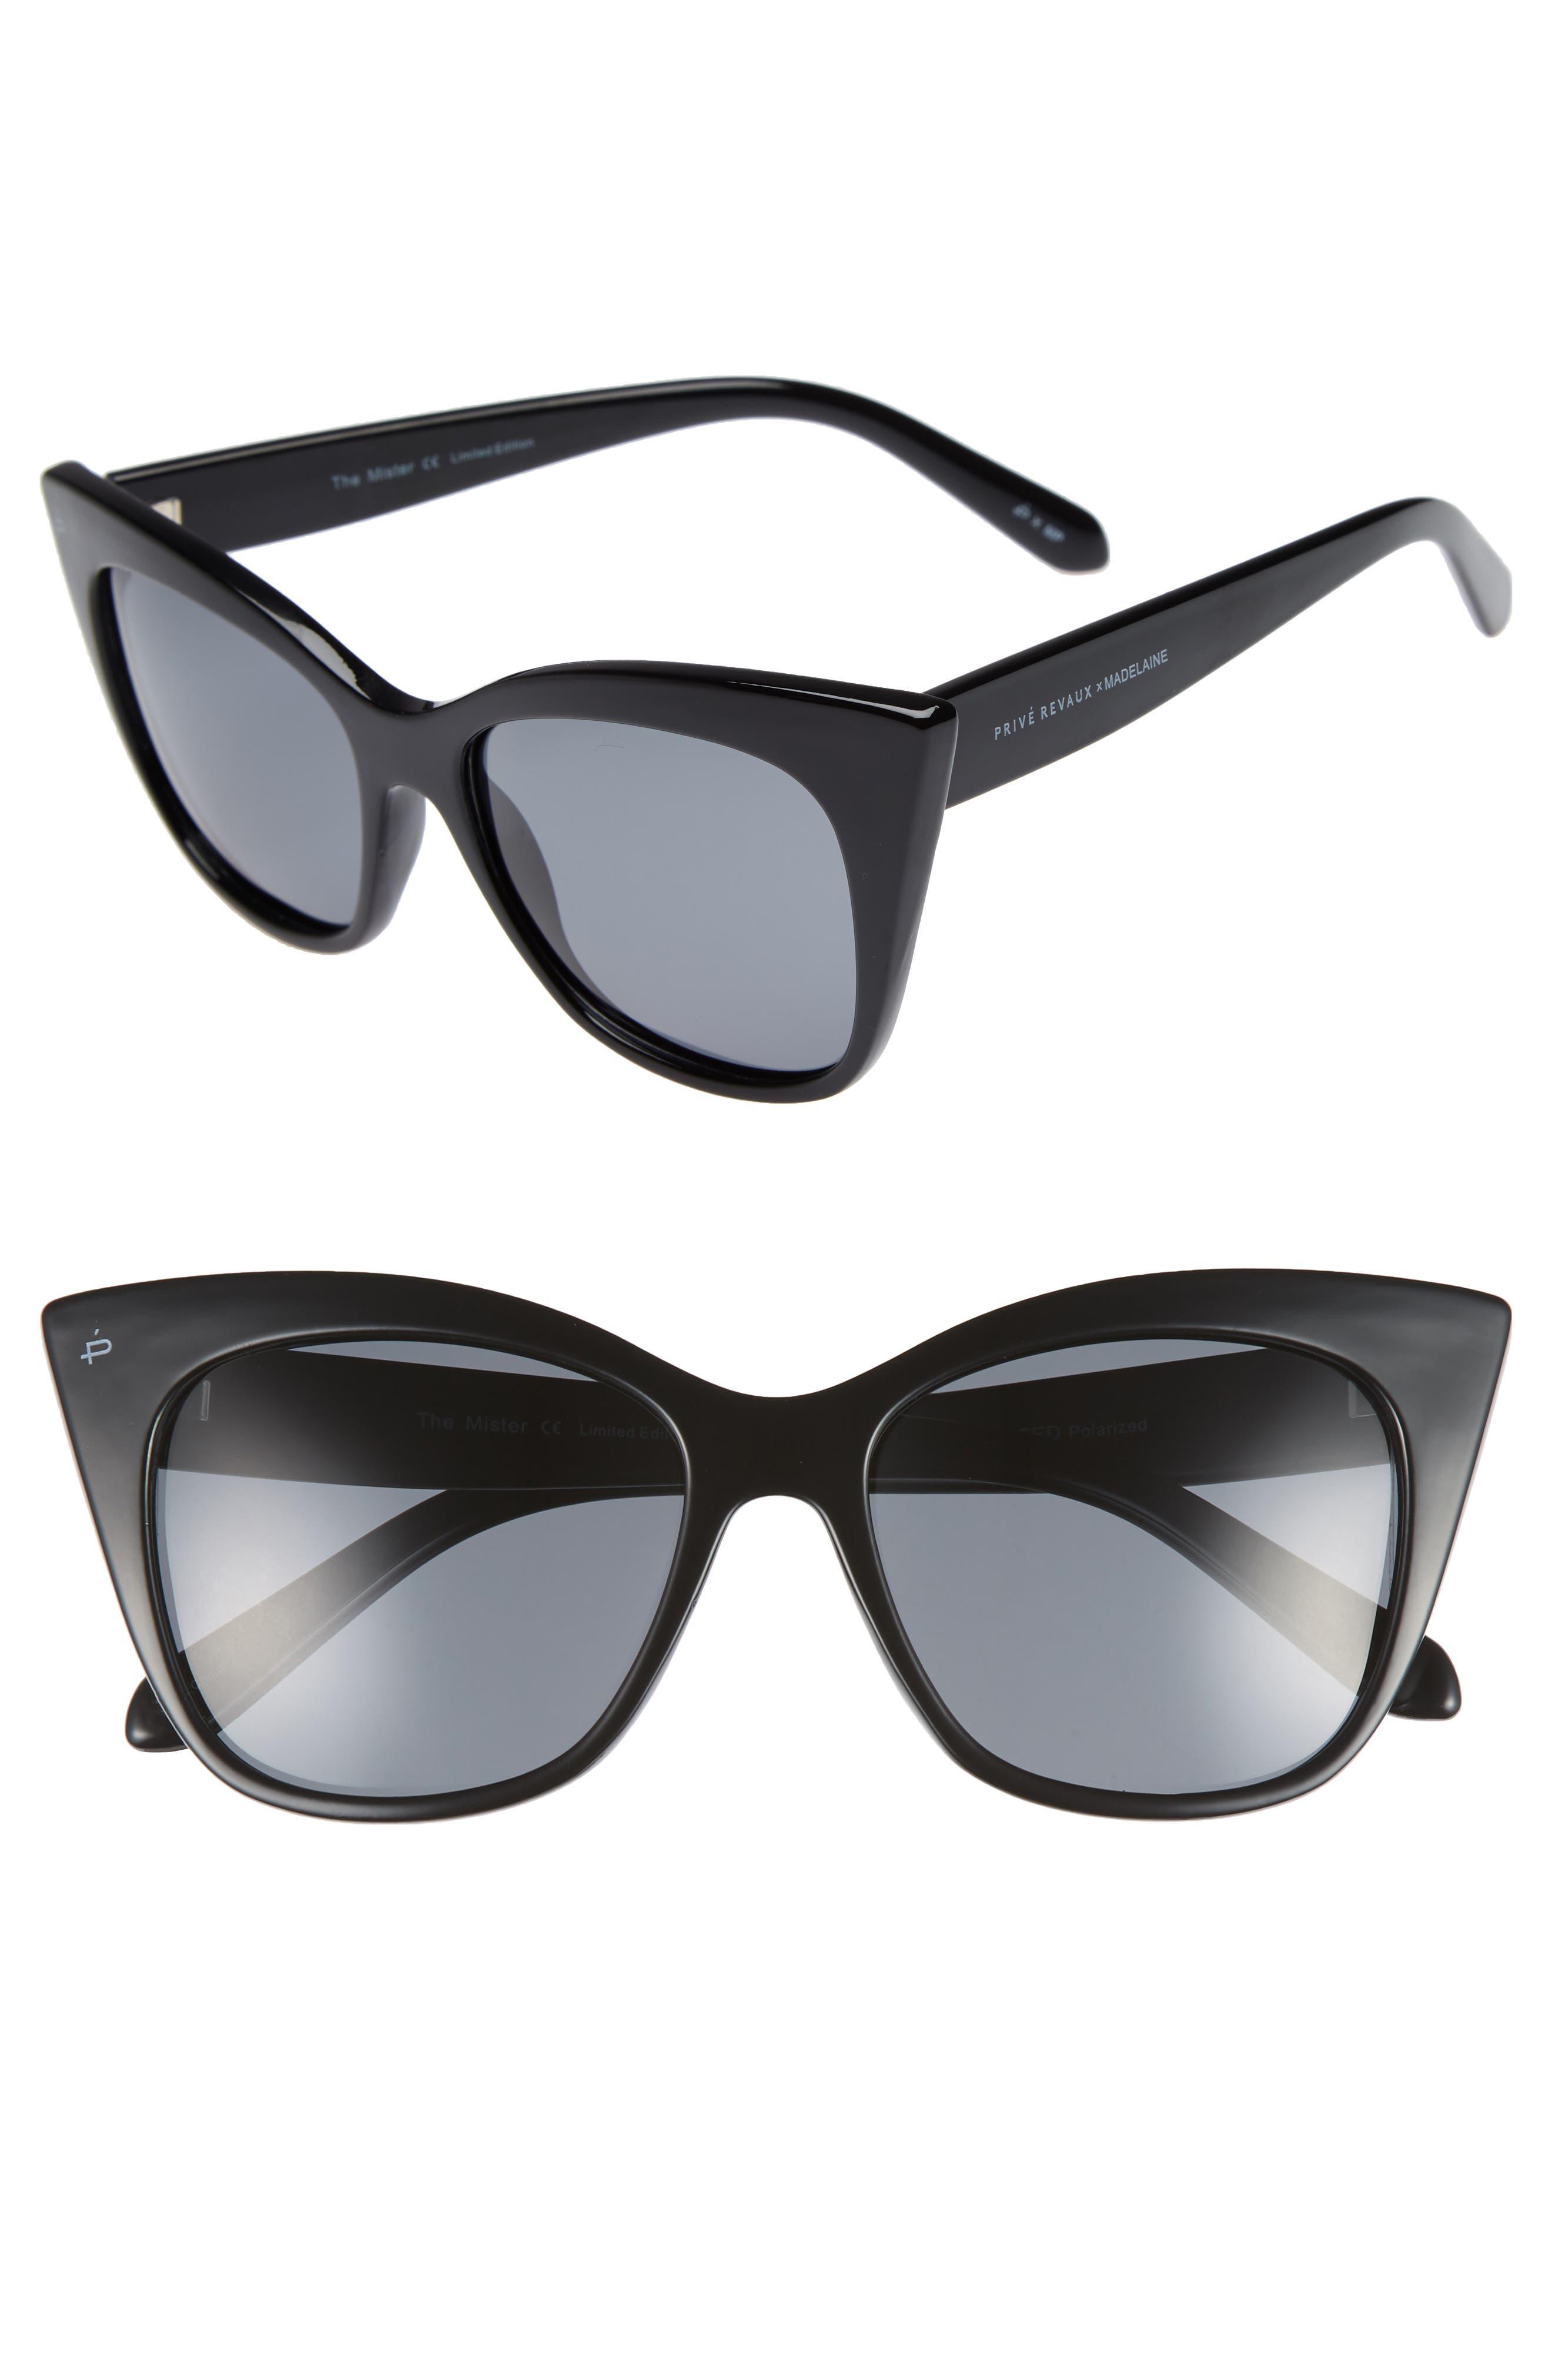 Privé Revaux x Madelaine Petsch The Mister 54mm Cat Eye Sunglasses,                             Main thumbnail 1, color,                             Black/ Black